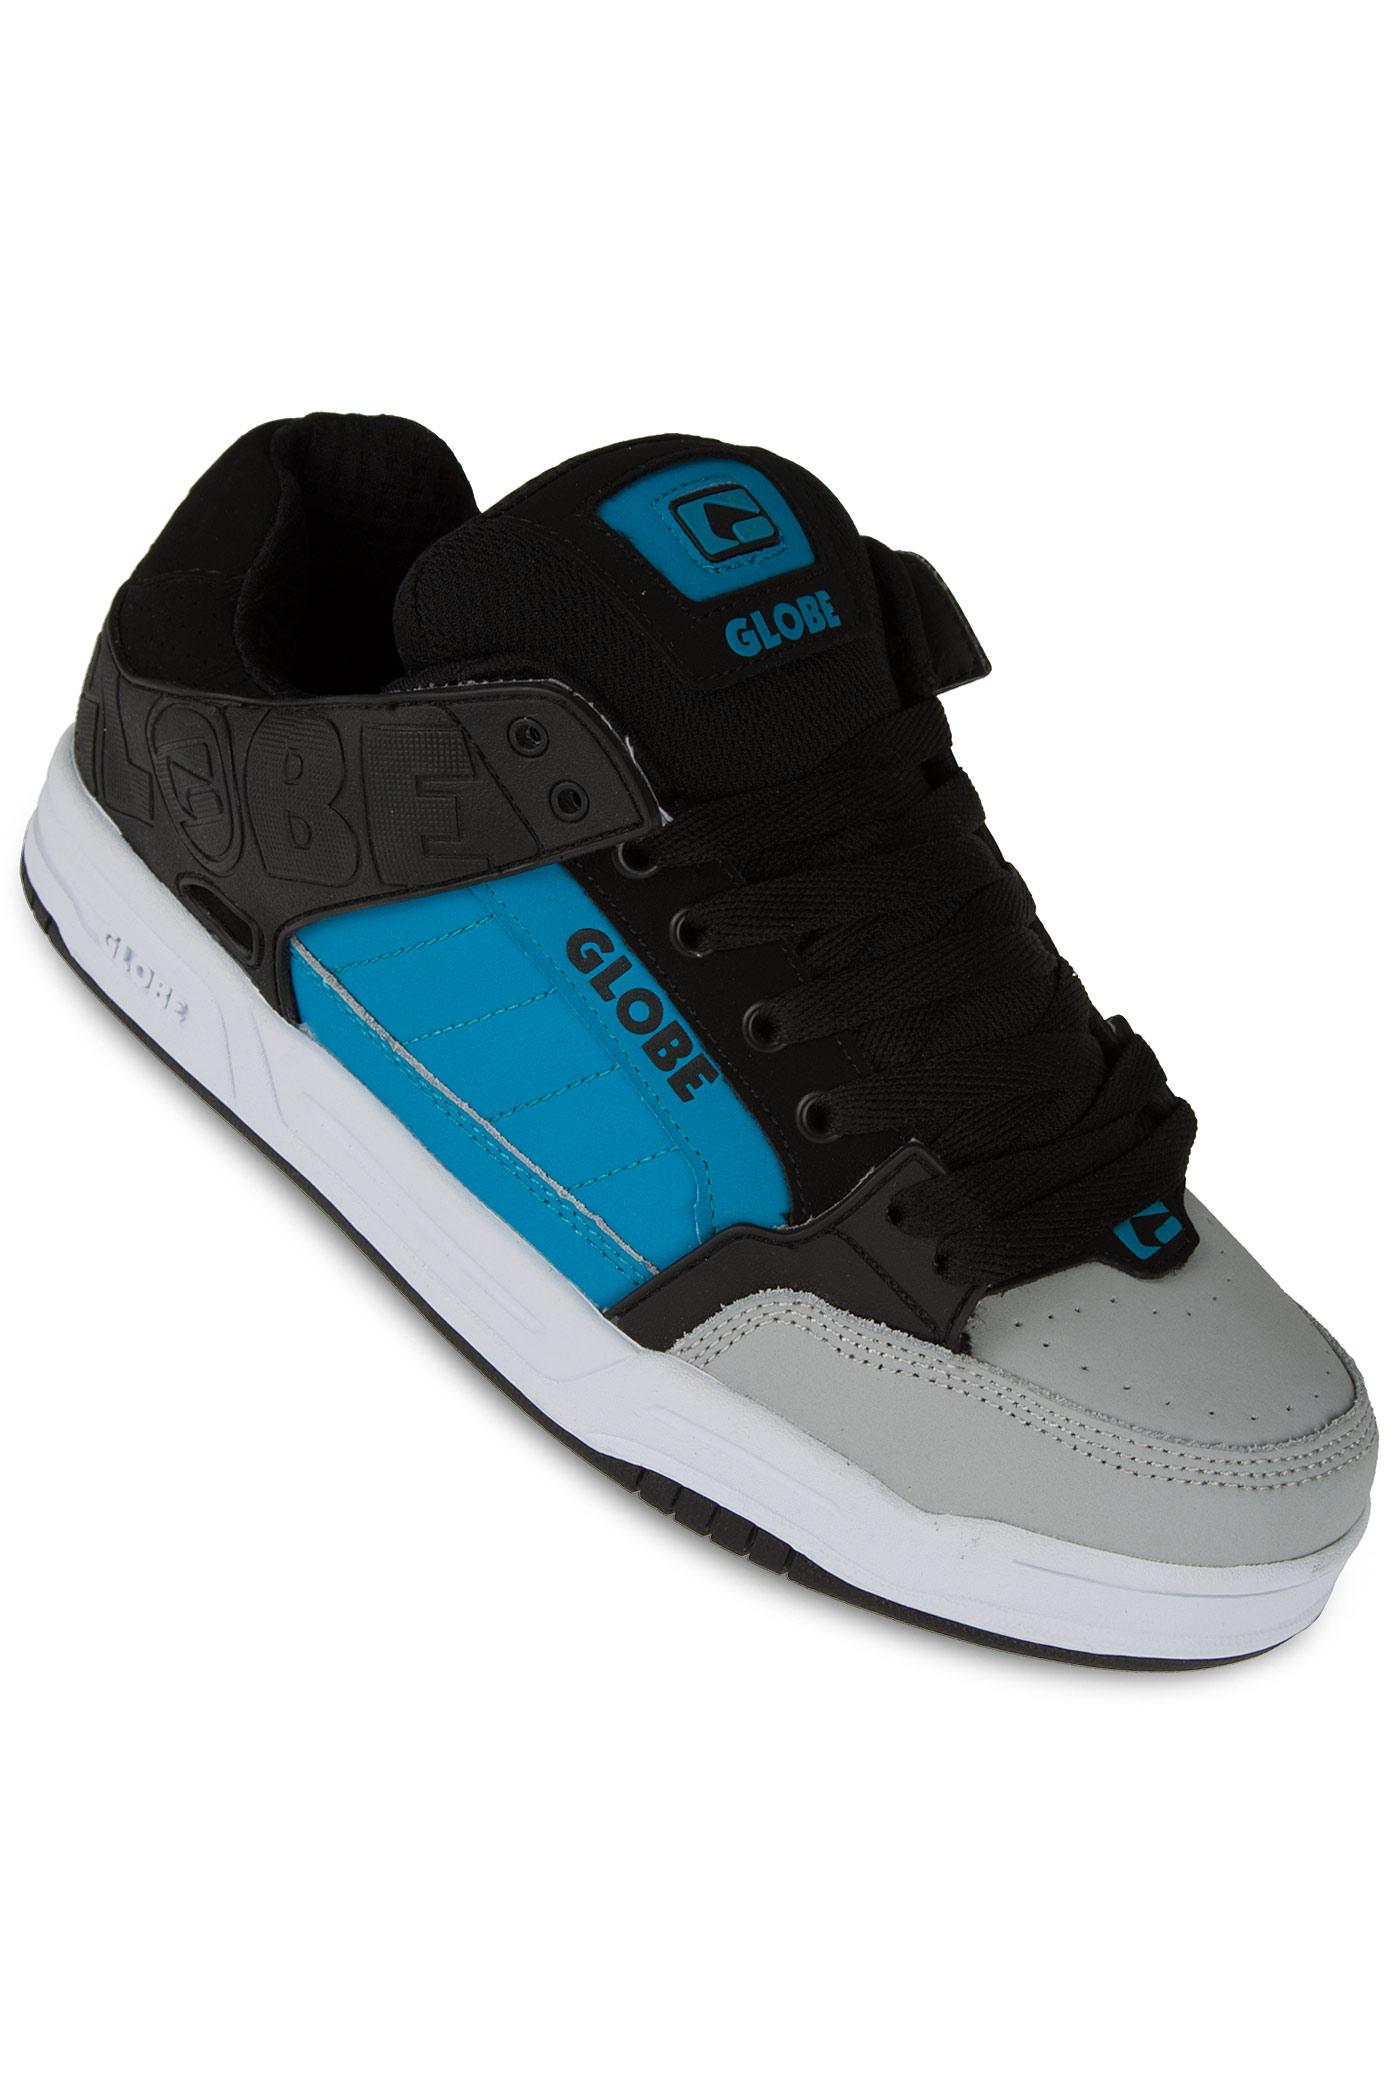 Buy Globe Shoes Canada